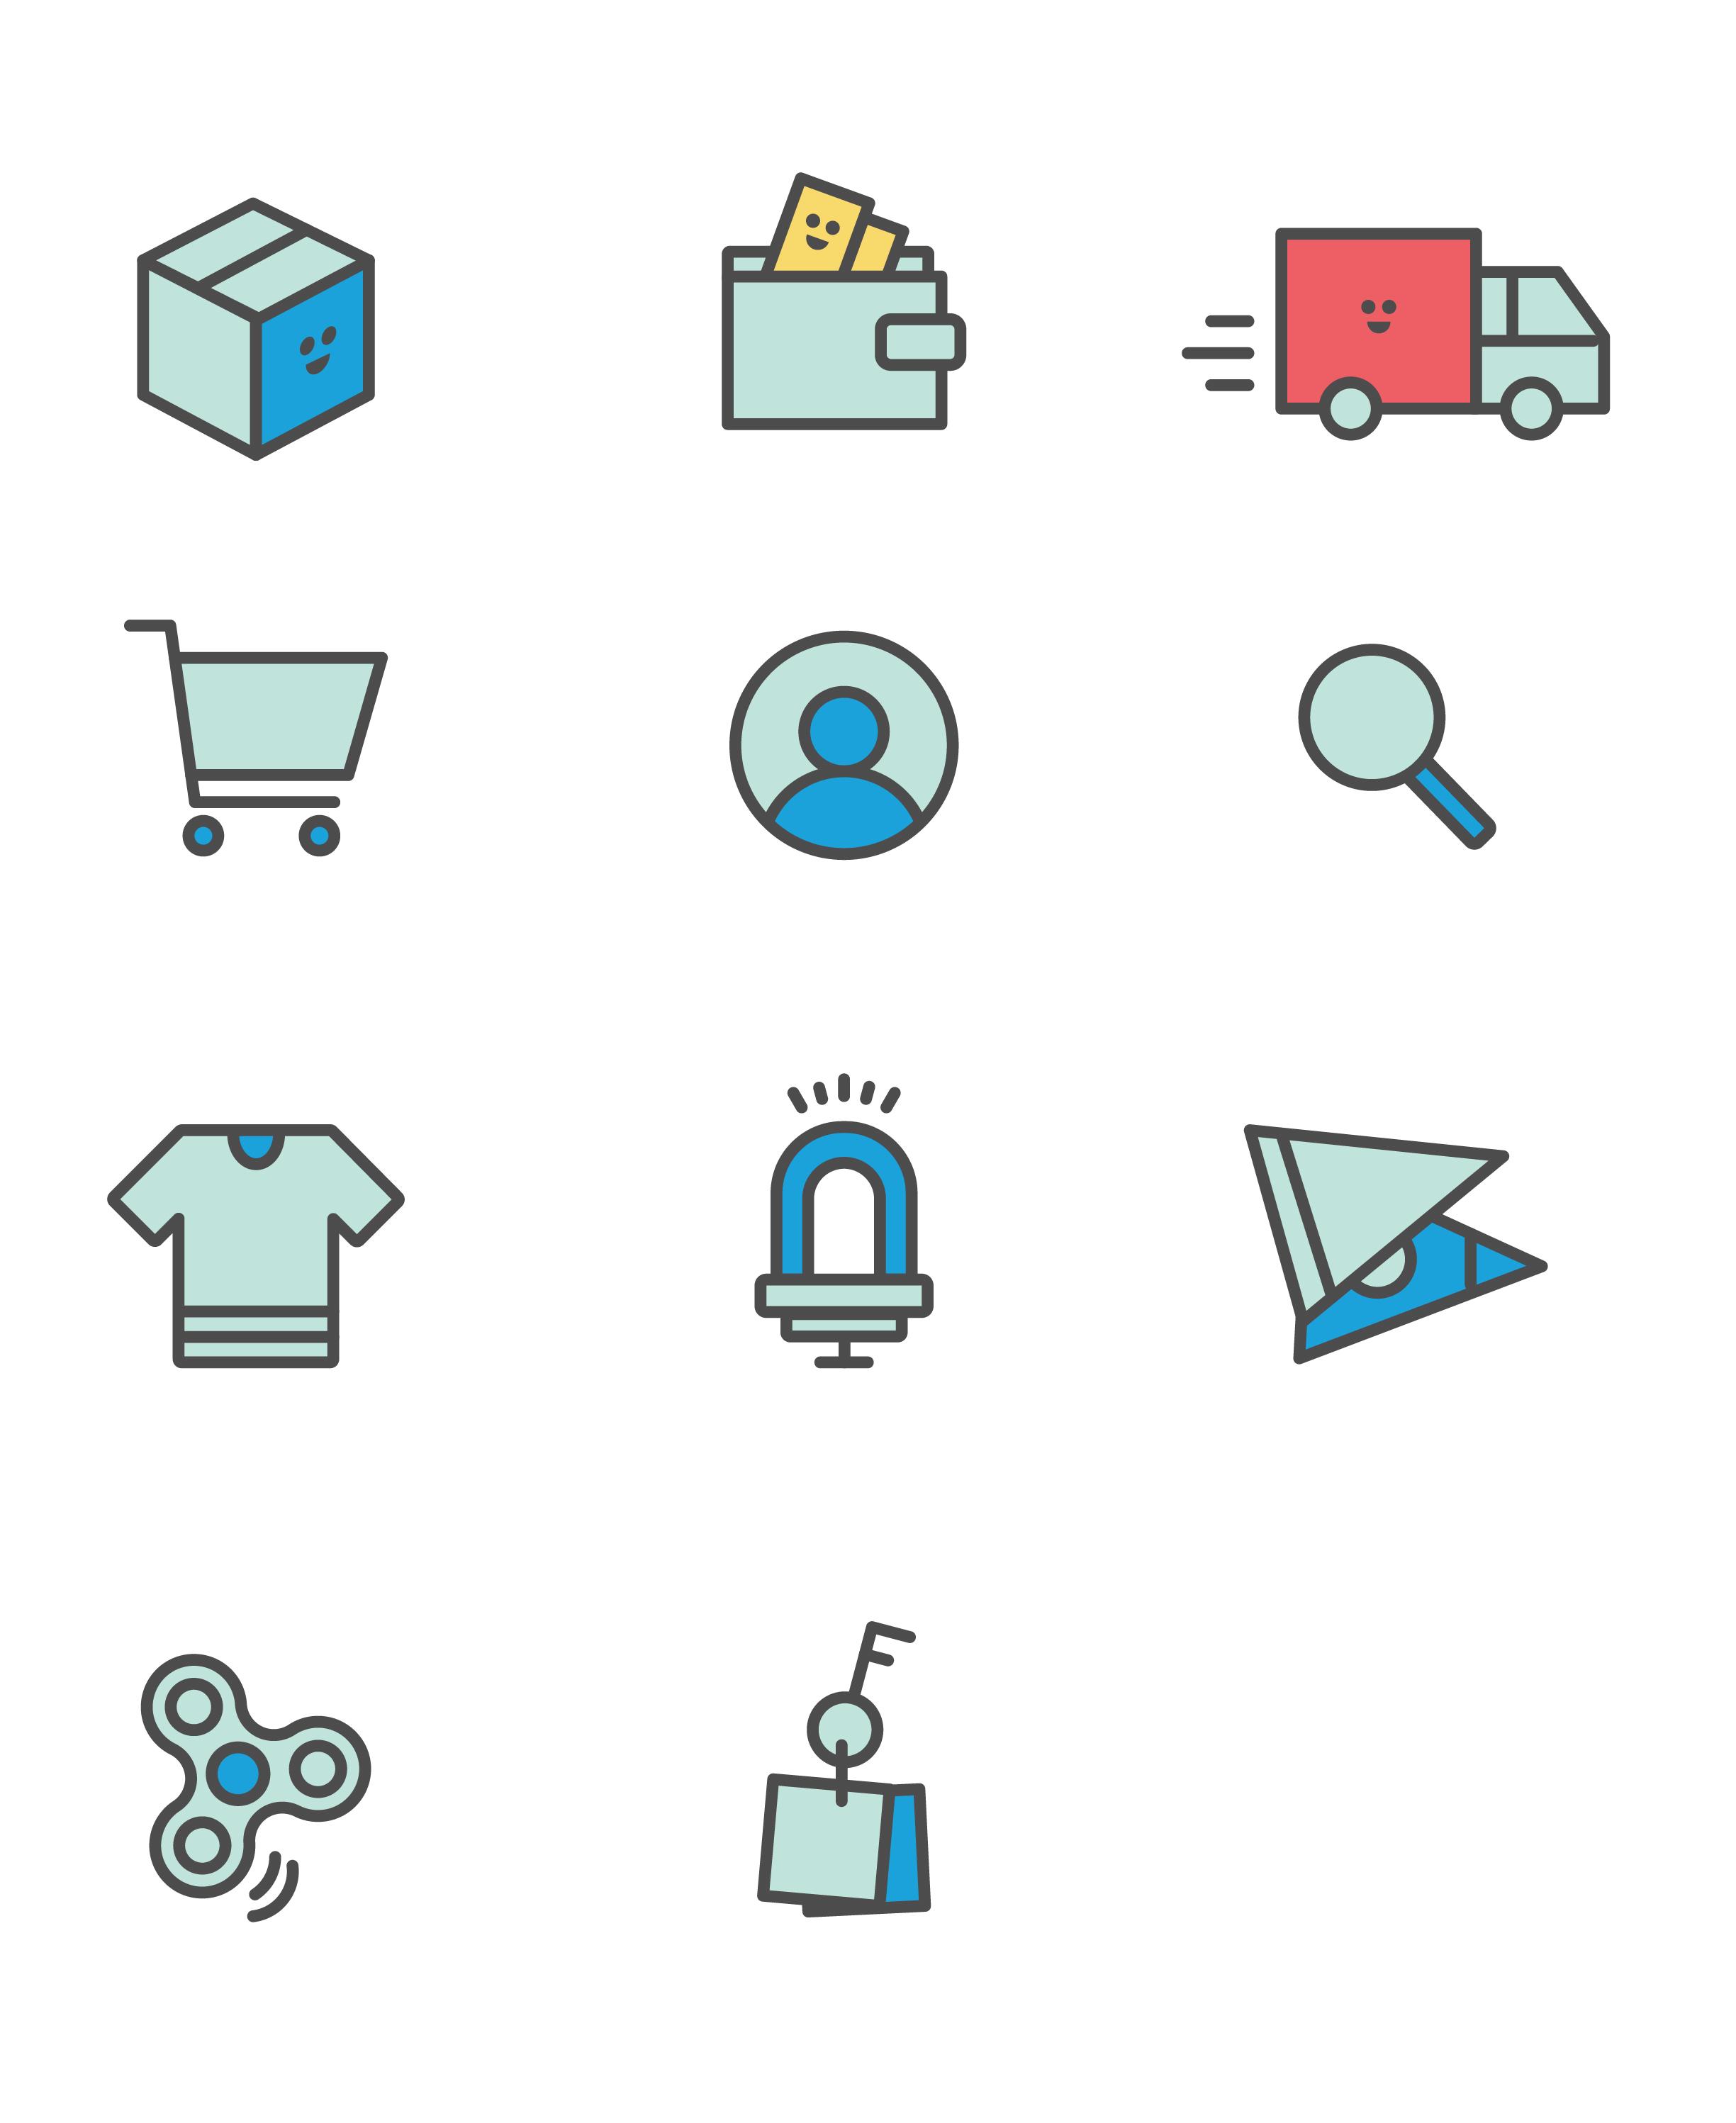 FantFit_Iconography_1-01.jpg